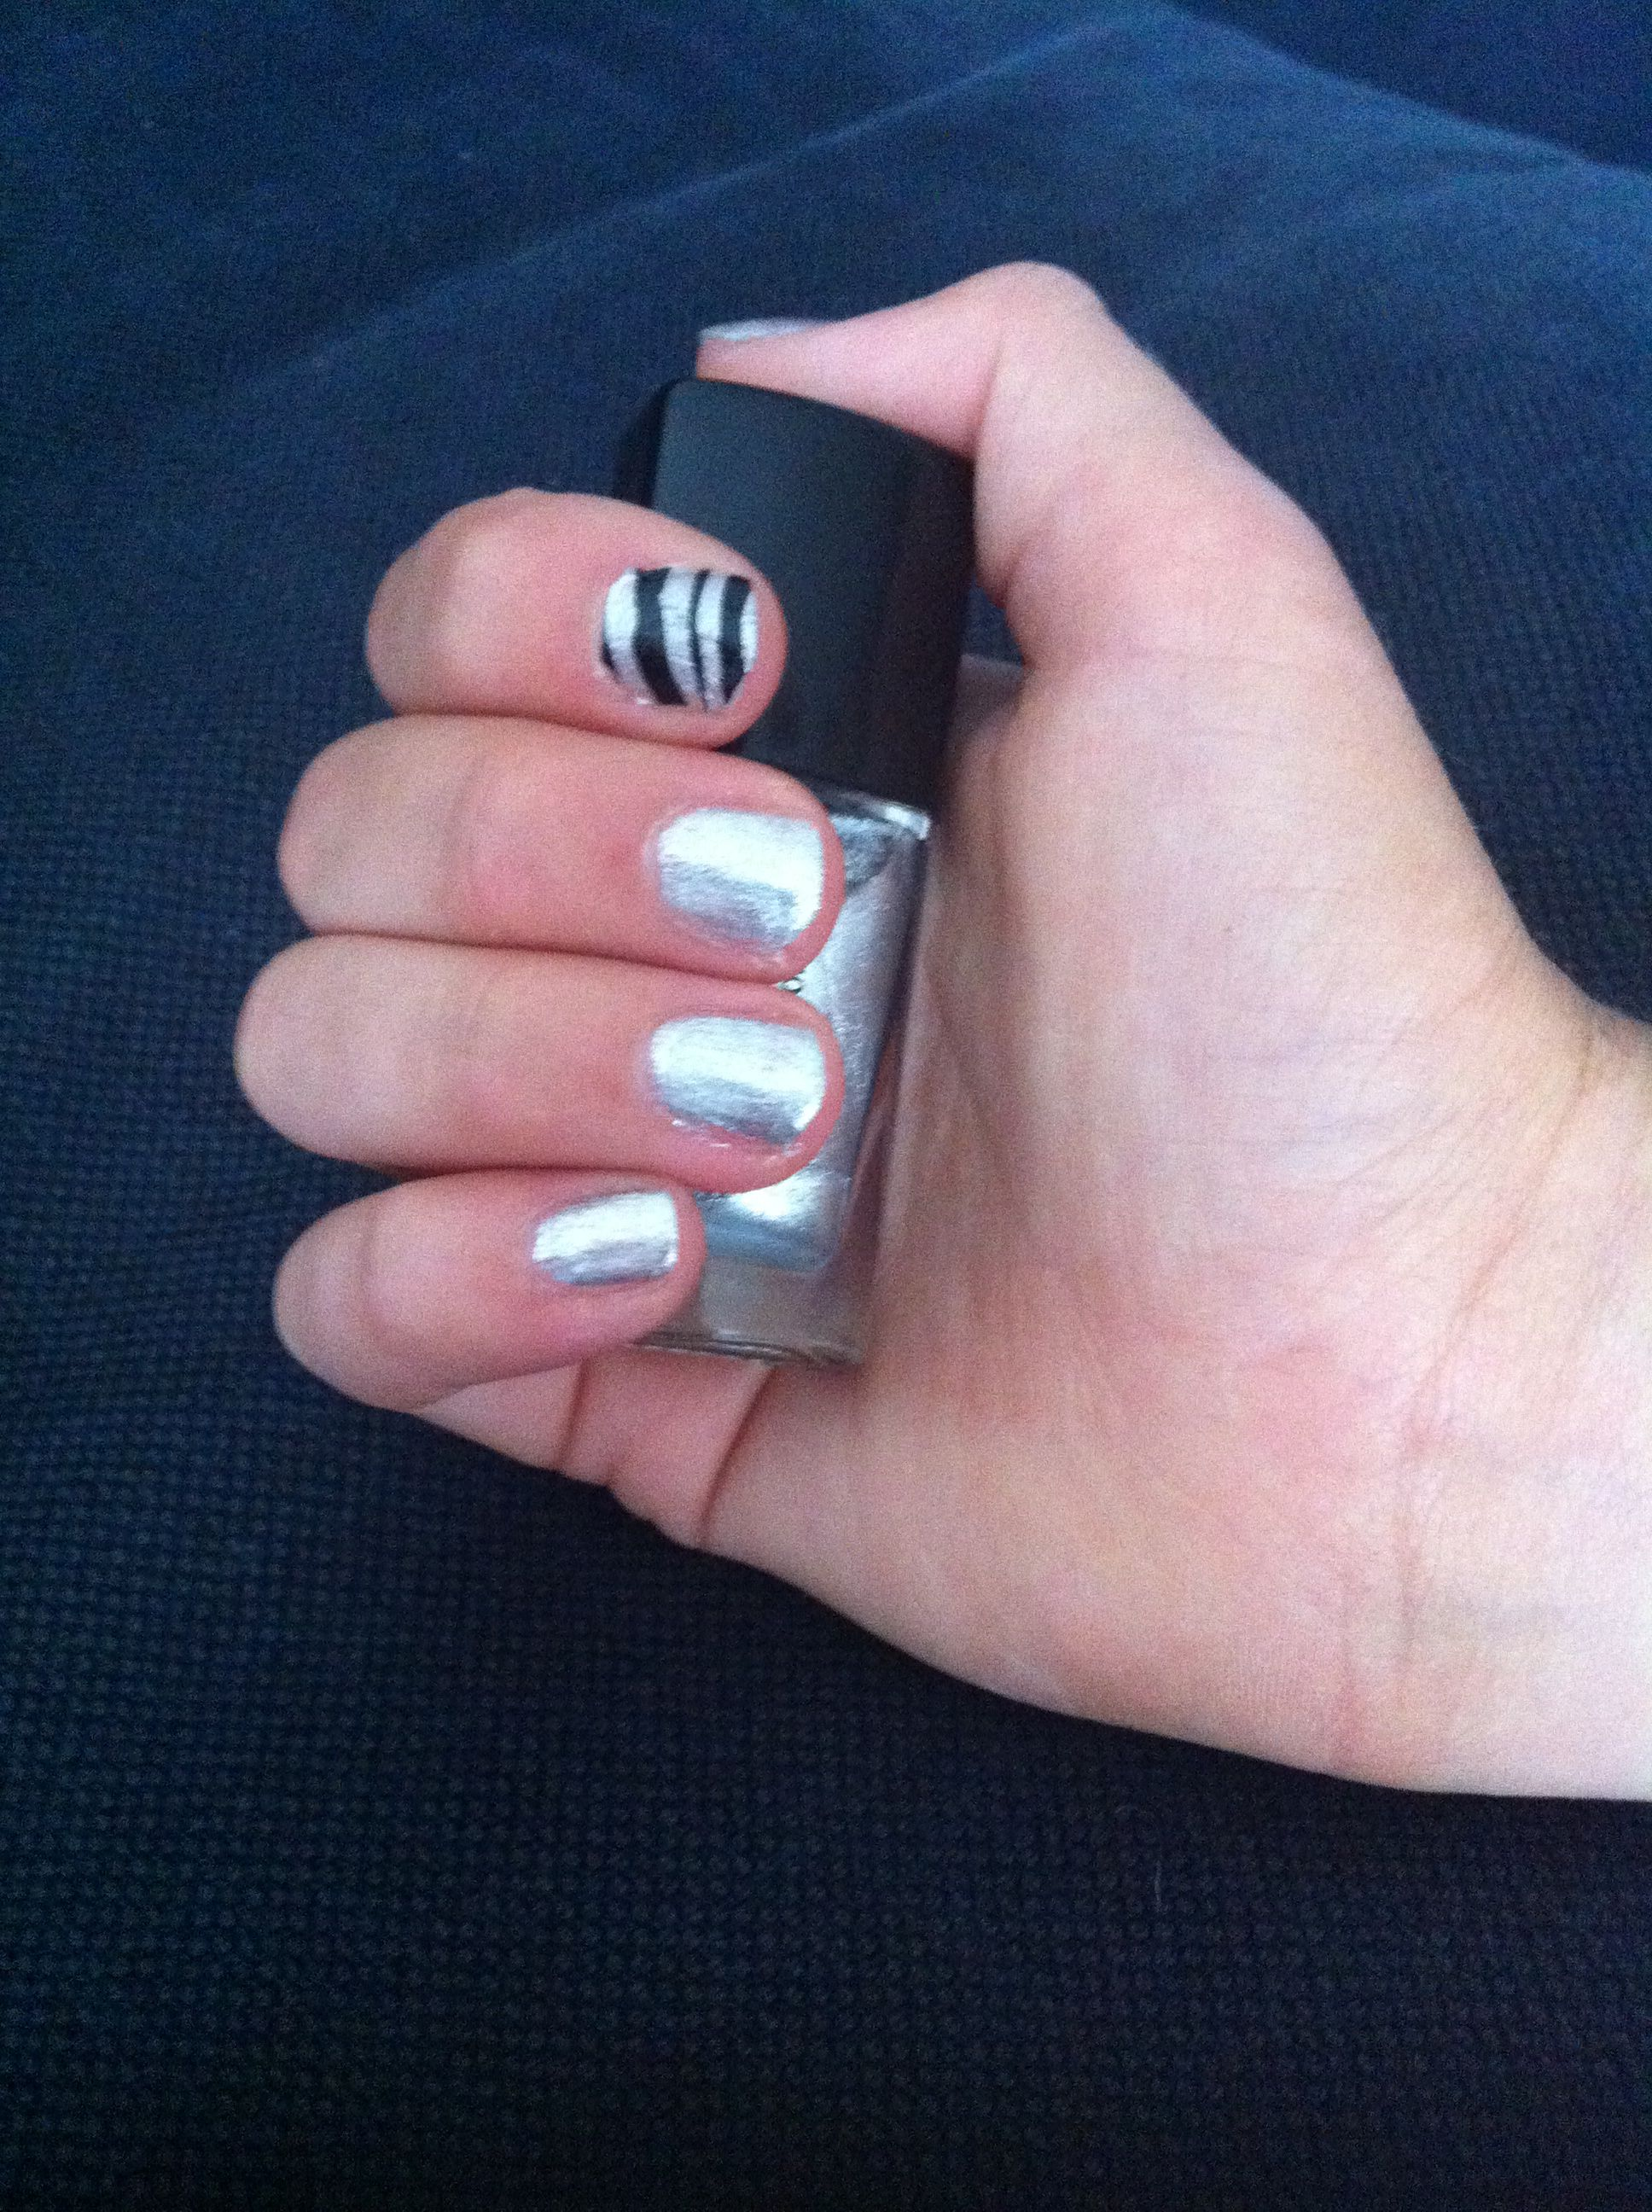 Leuke makkelijke nail art voor korte nagels - nagels | Pinterest ...